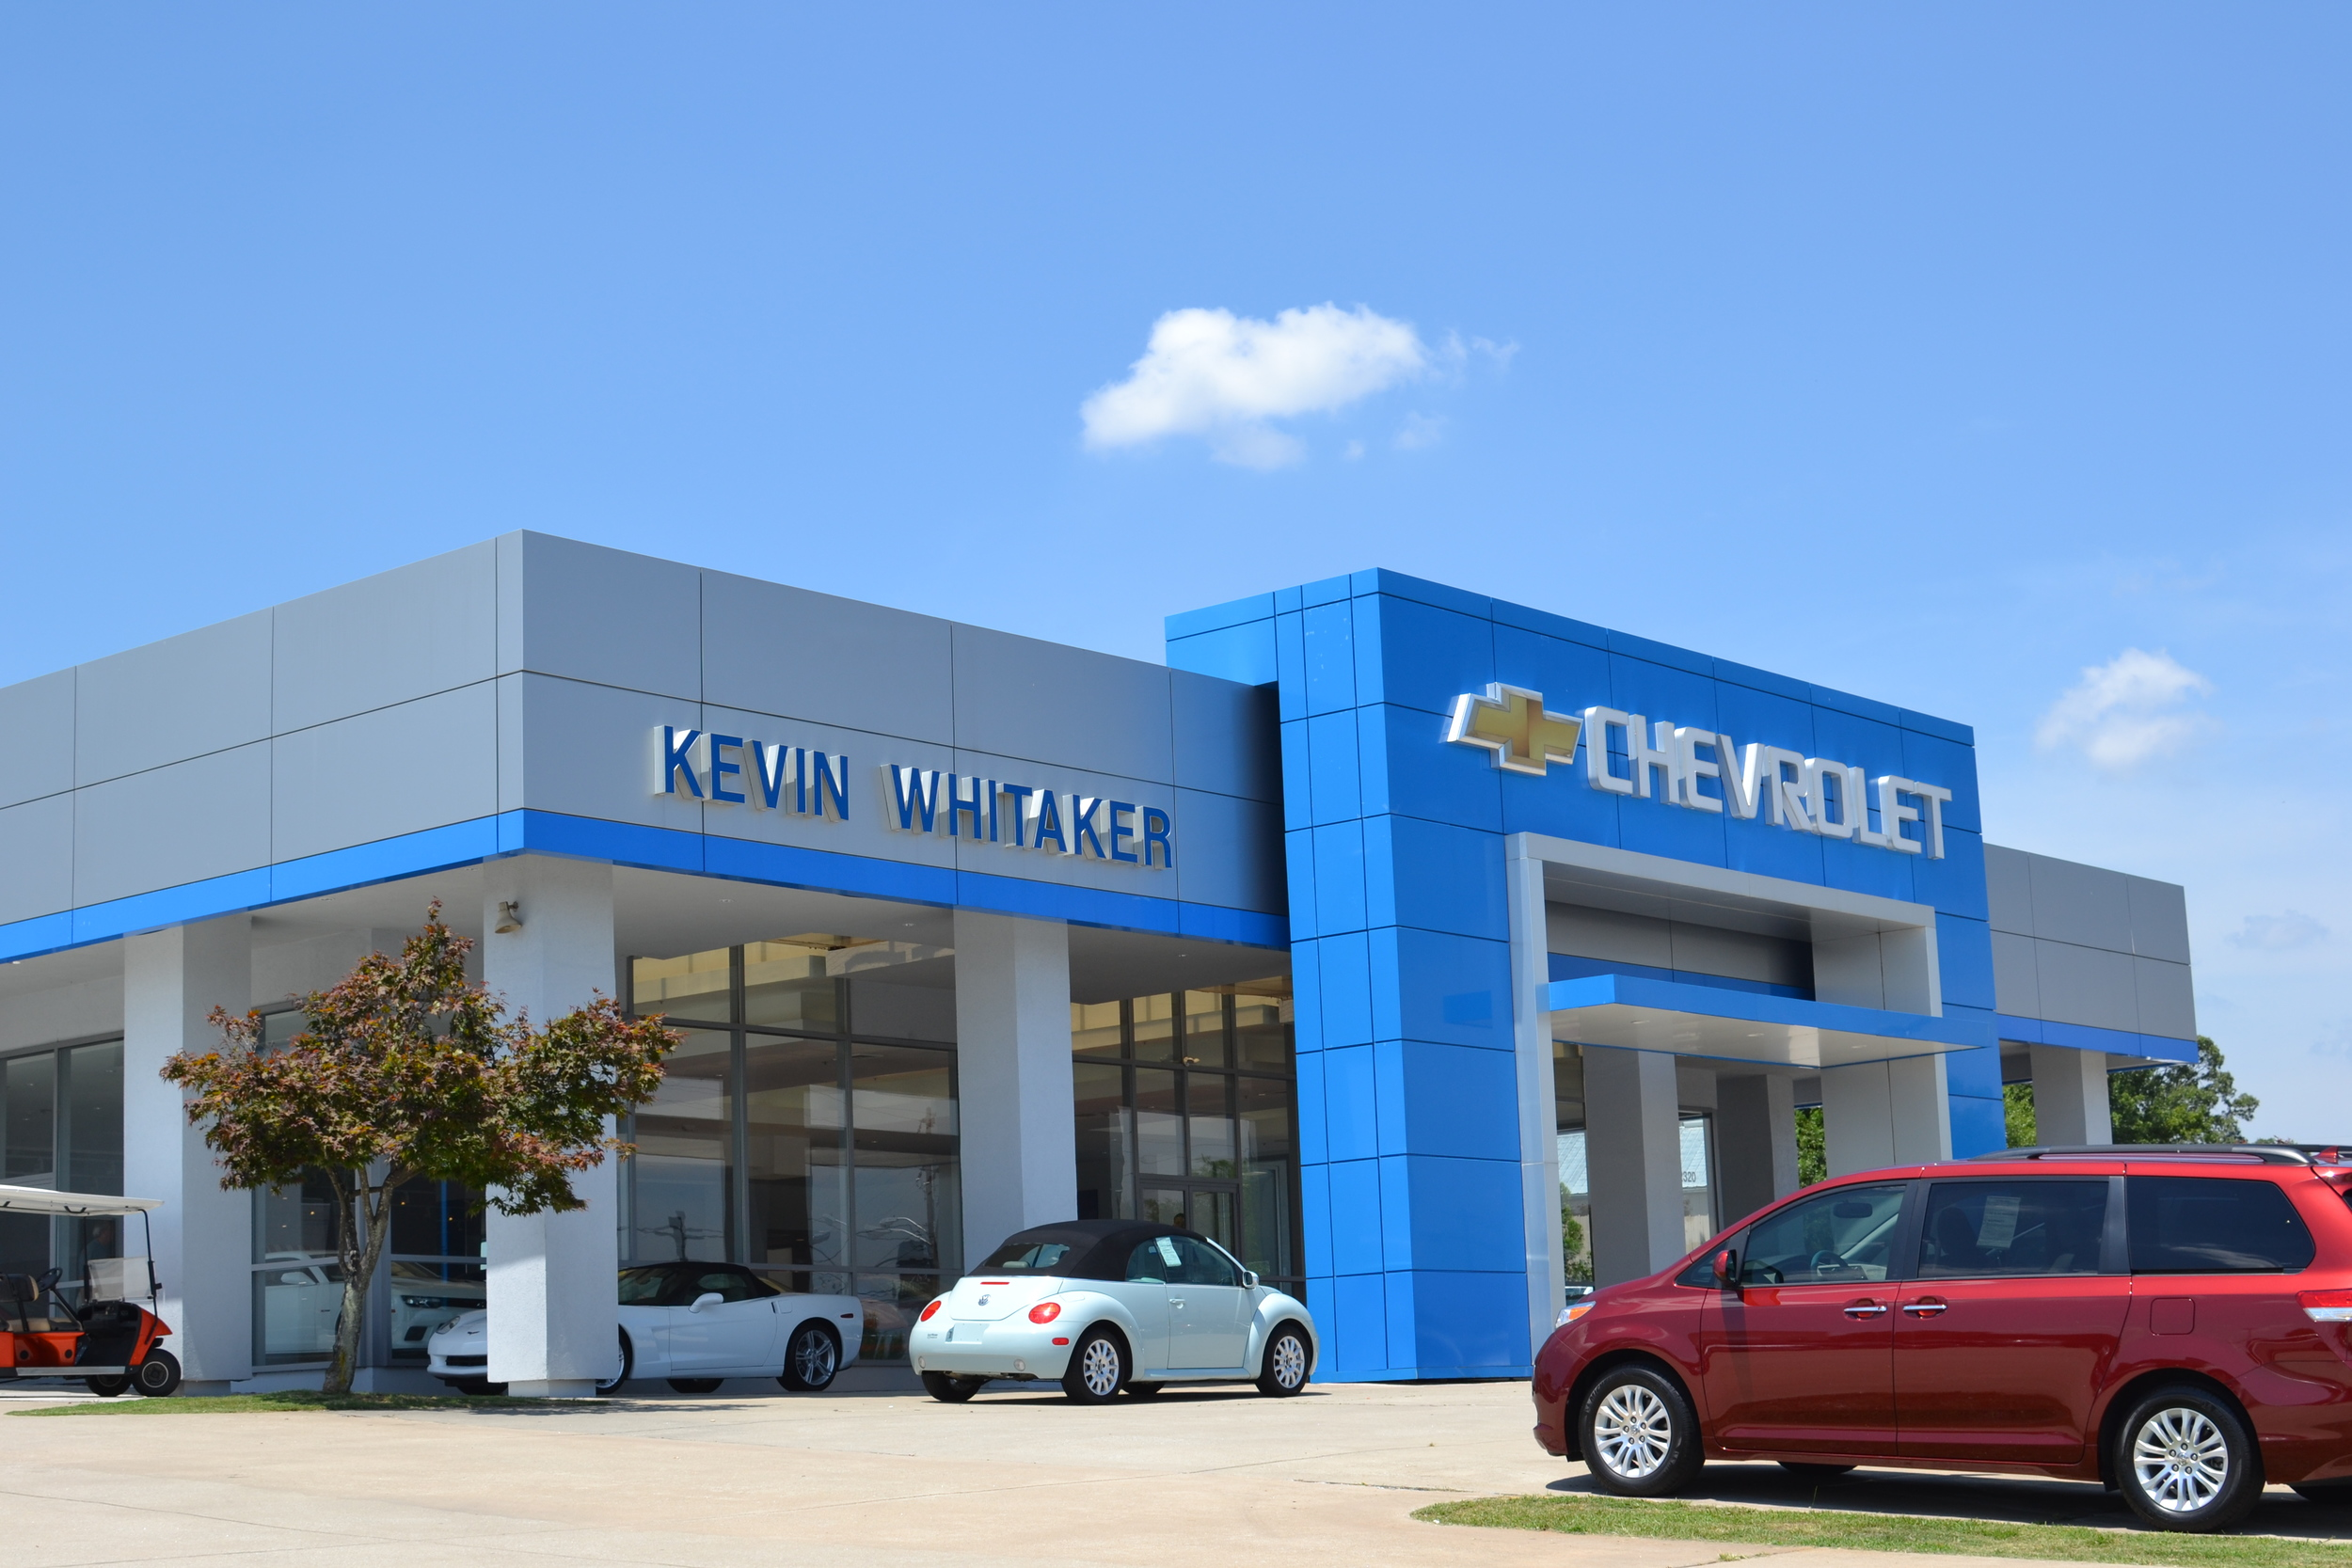 Kevin Whitaker Chevrolet